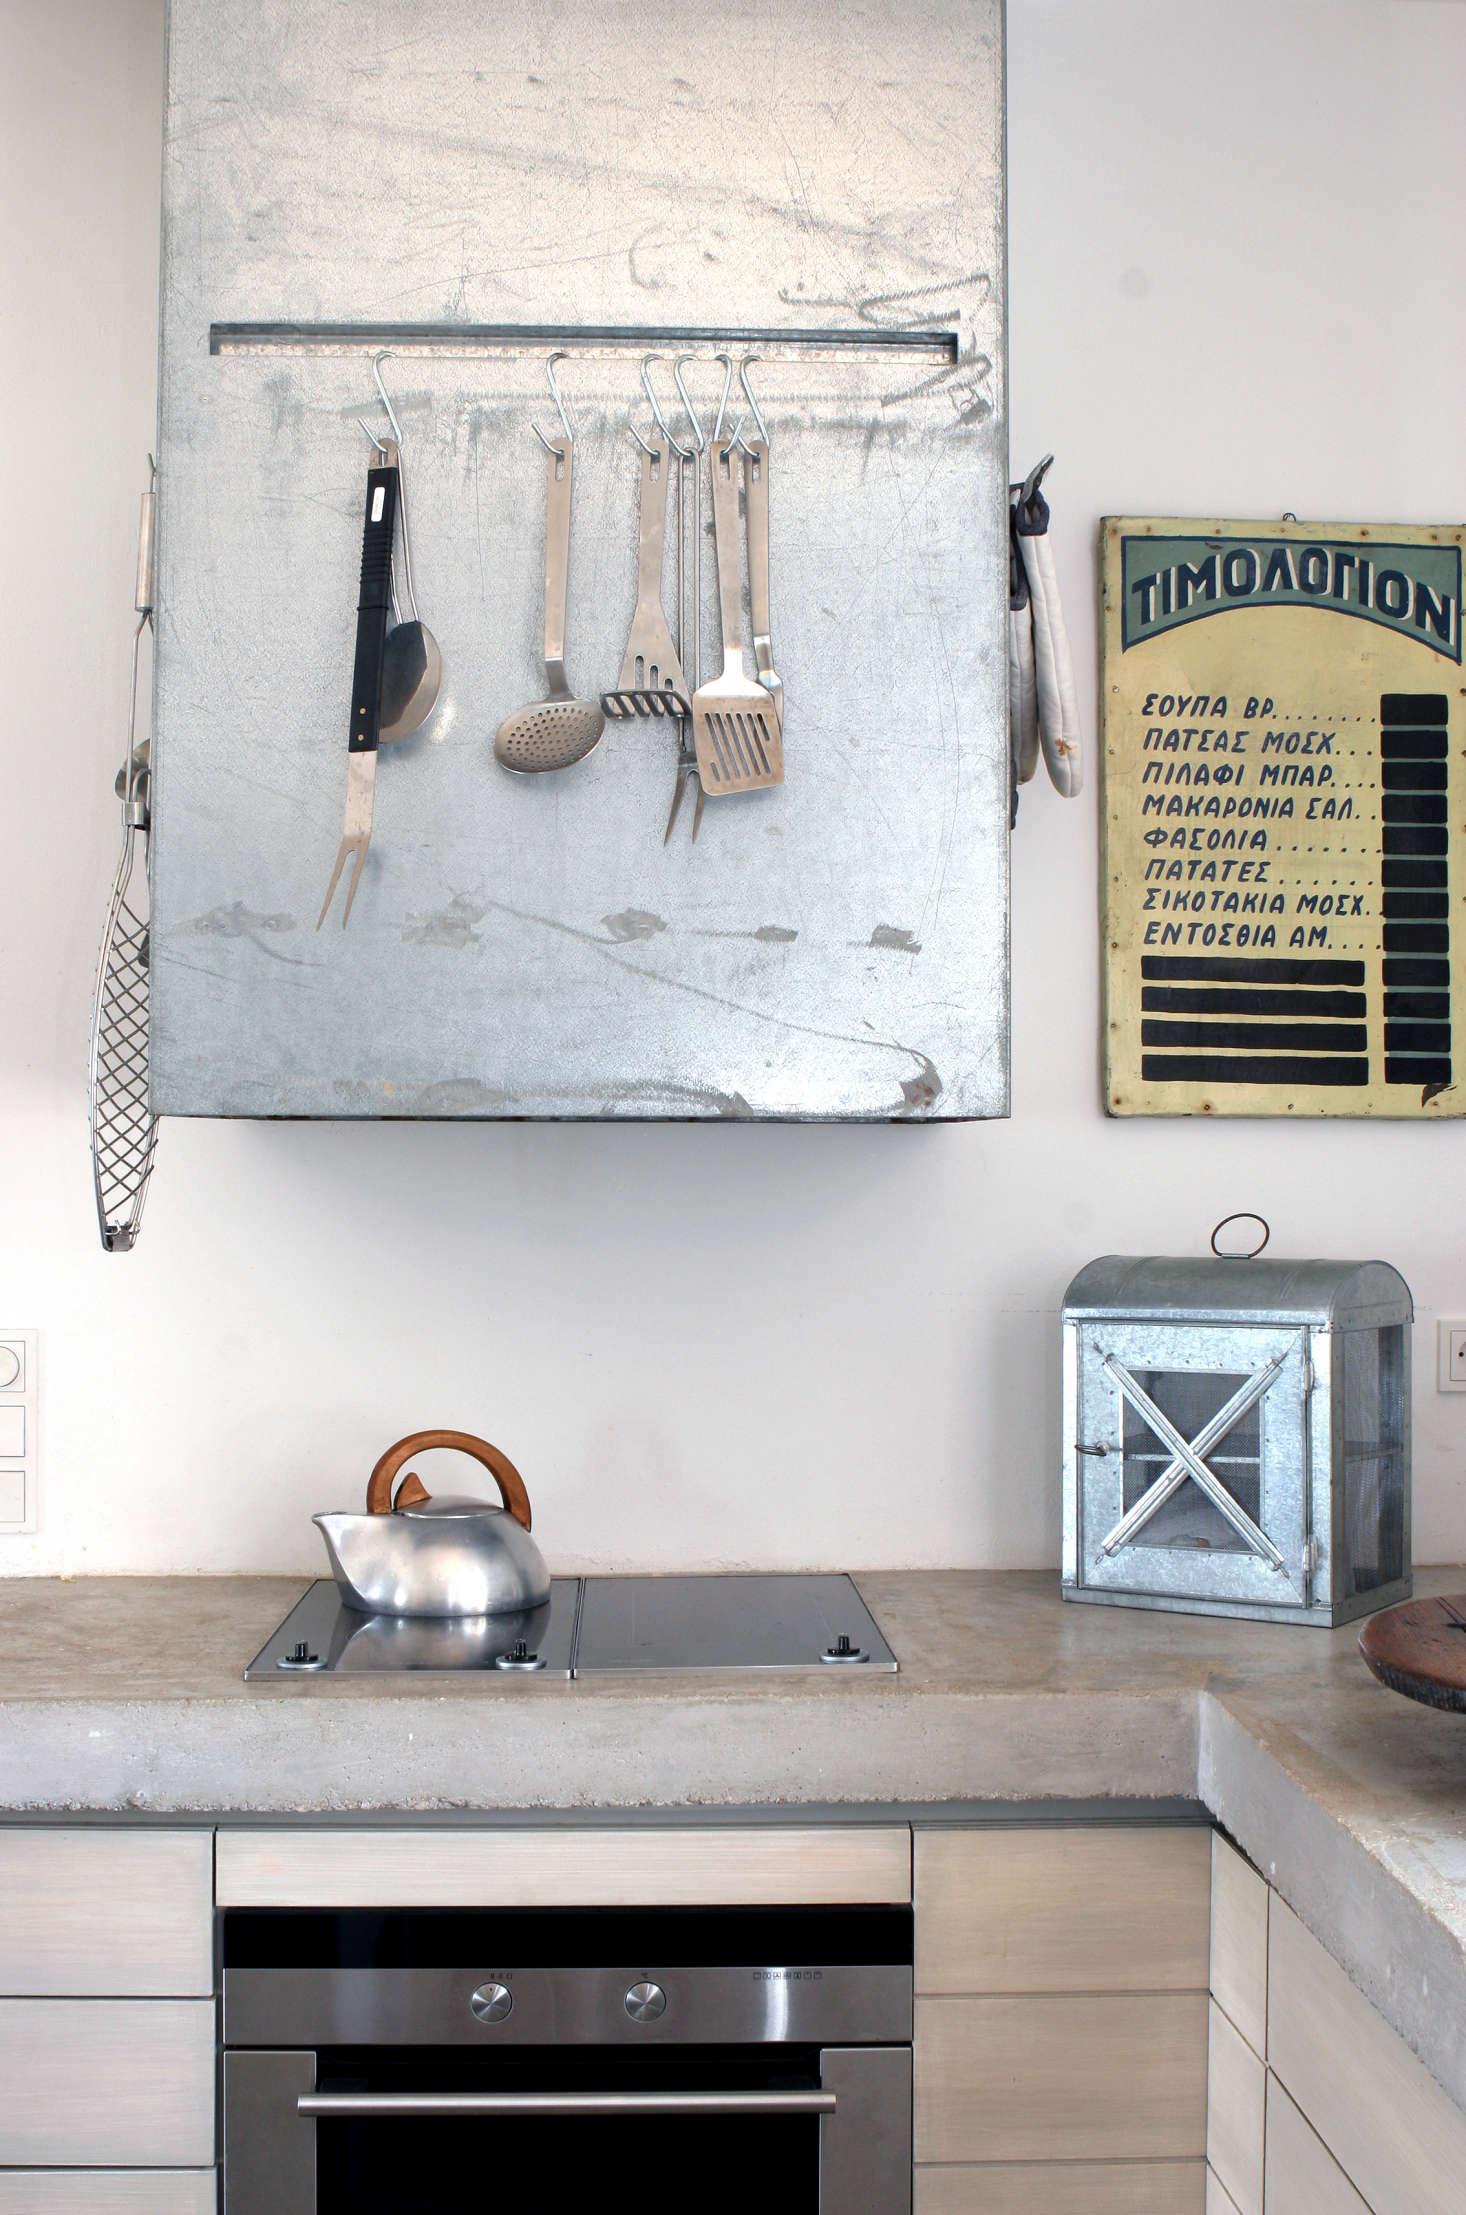 The concrete counter has heft: It&#8